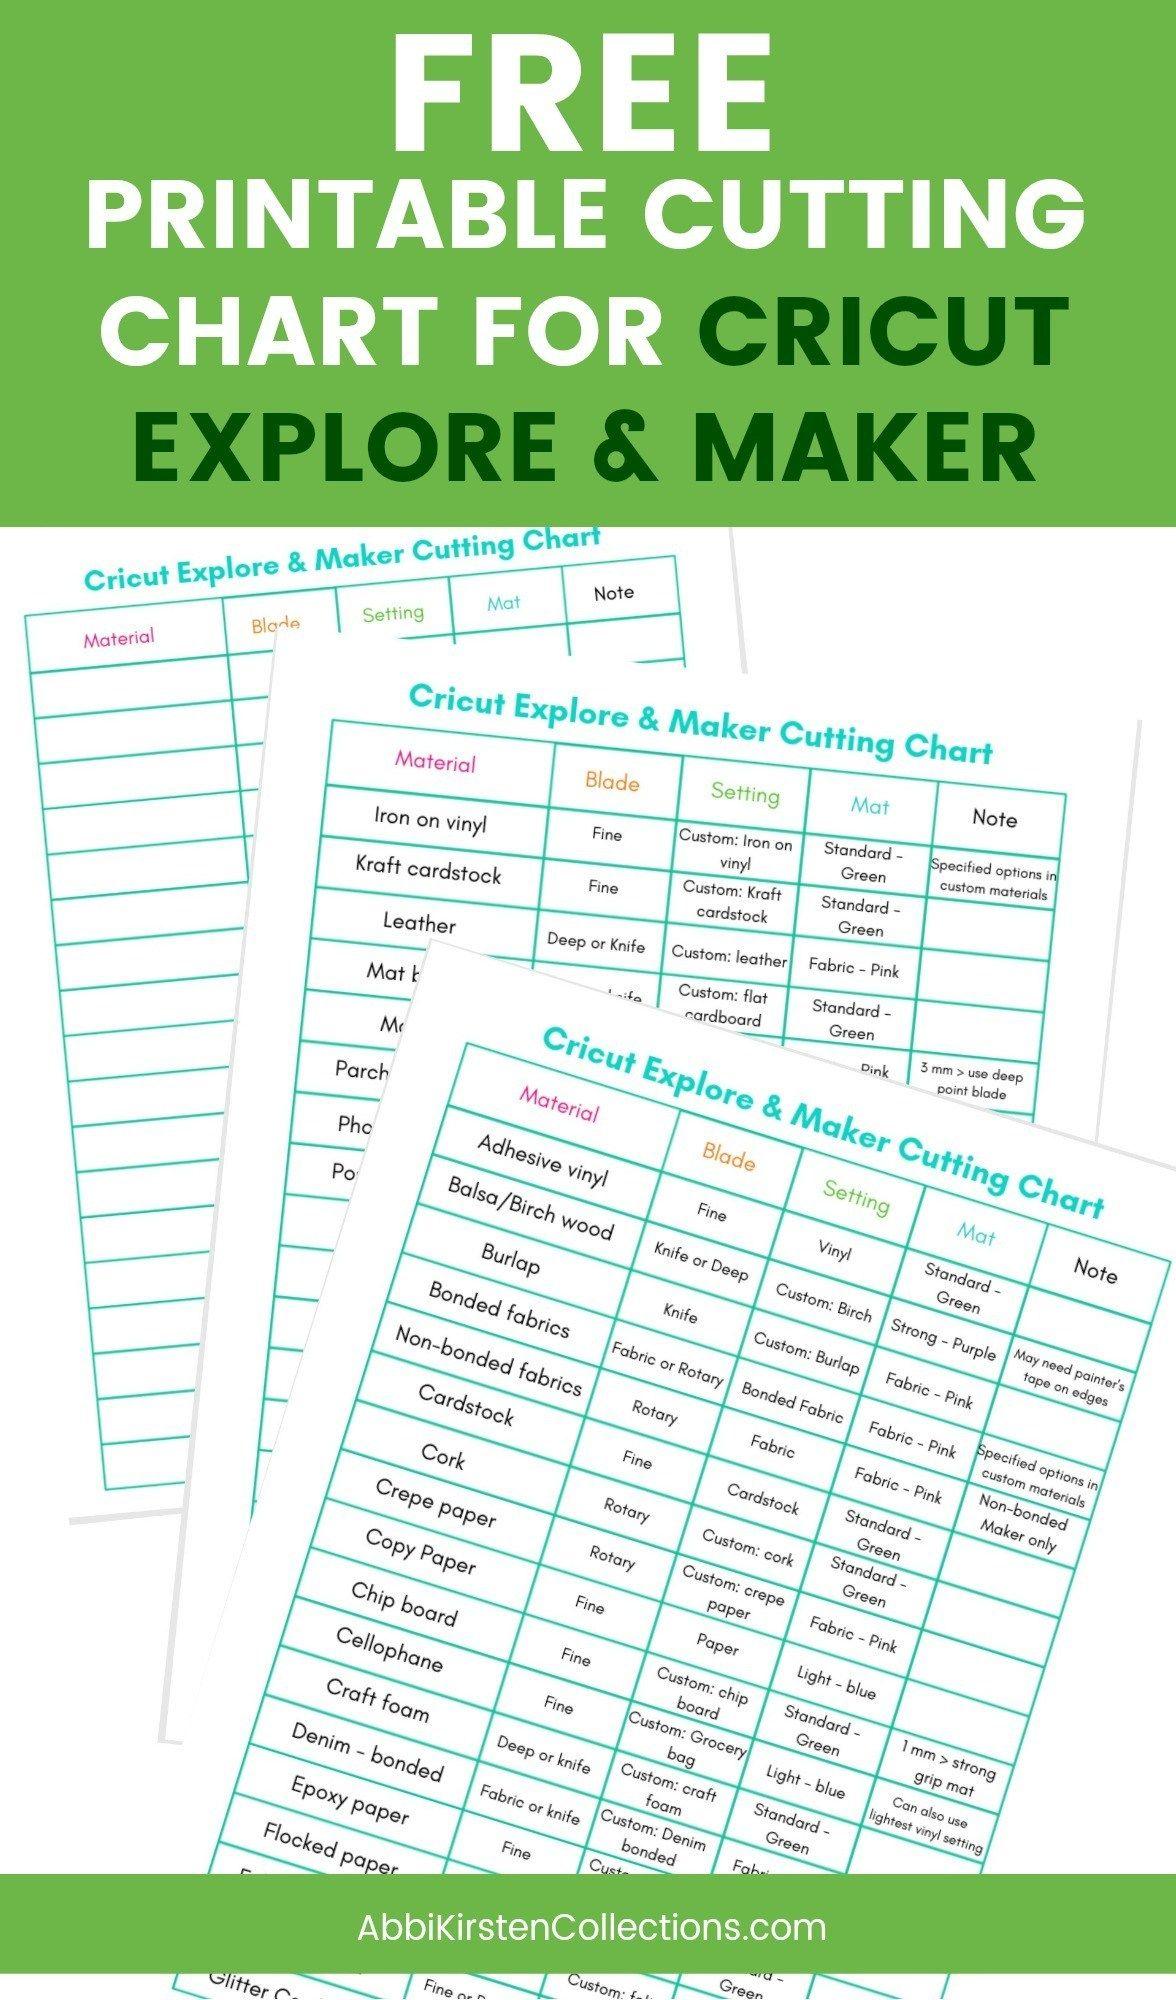 The Best Materials For Cricut Explore And Cricut Maker Machines Cricut Tutorials Cricut Explore Cricut Blades